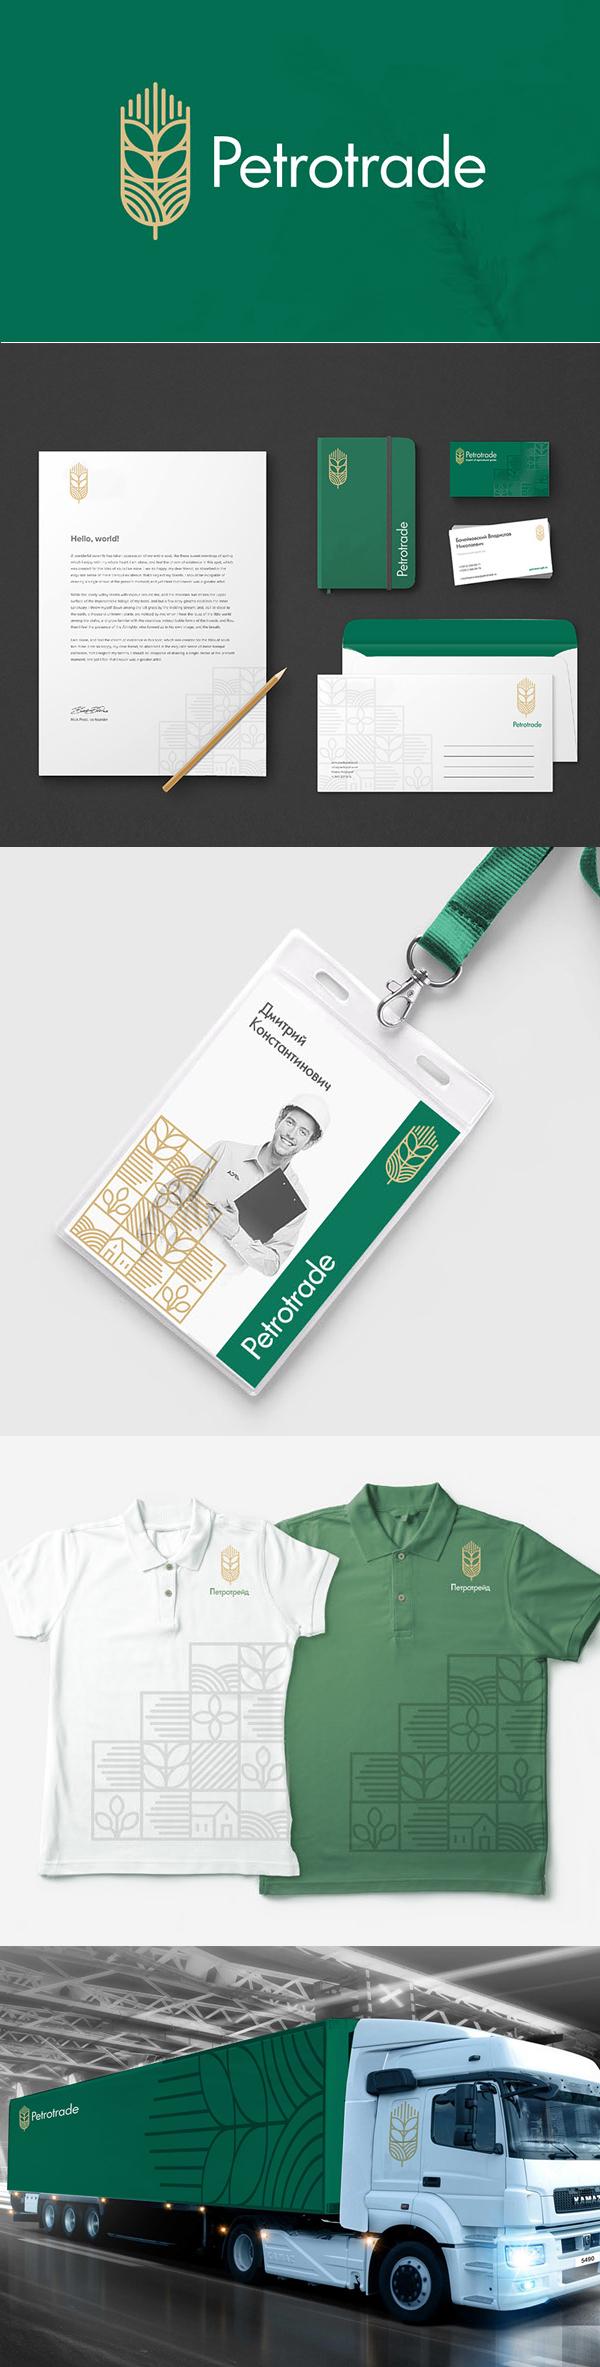 Branding: Petrotrade Branding by Dmitry Hartchikov